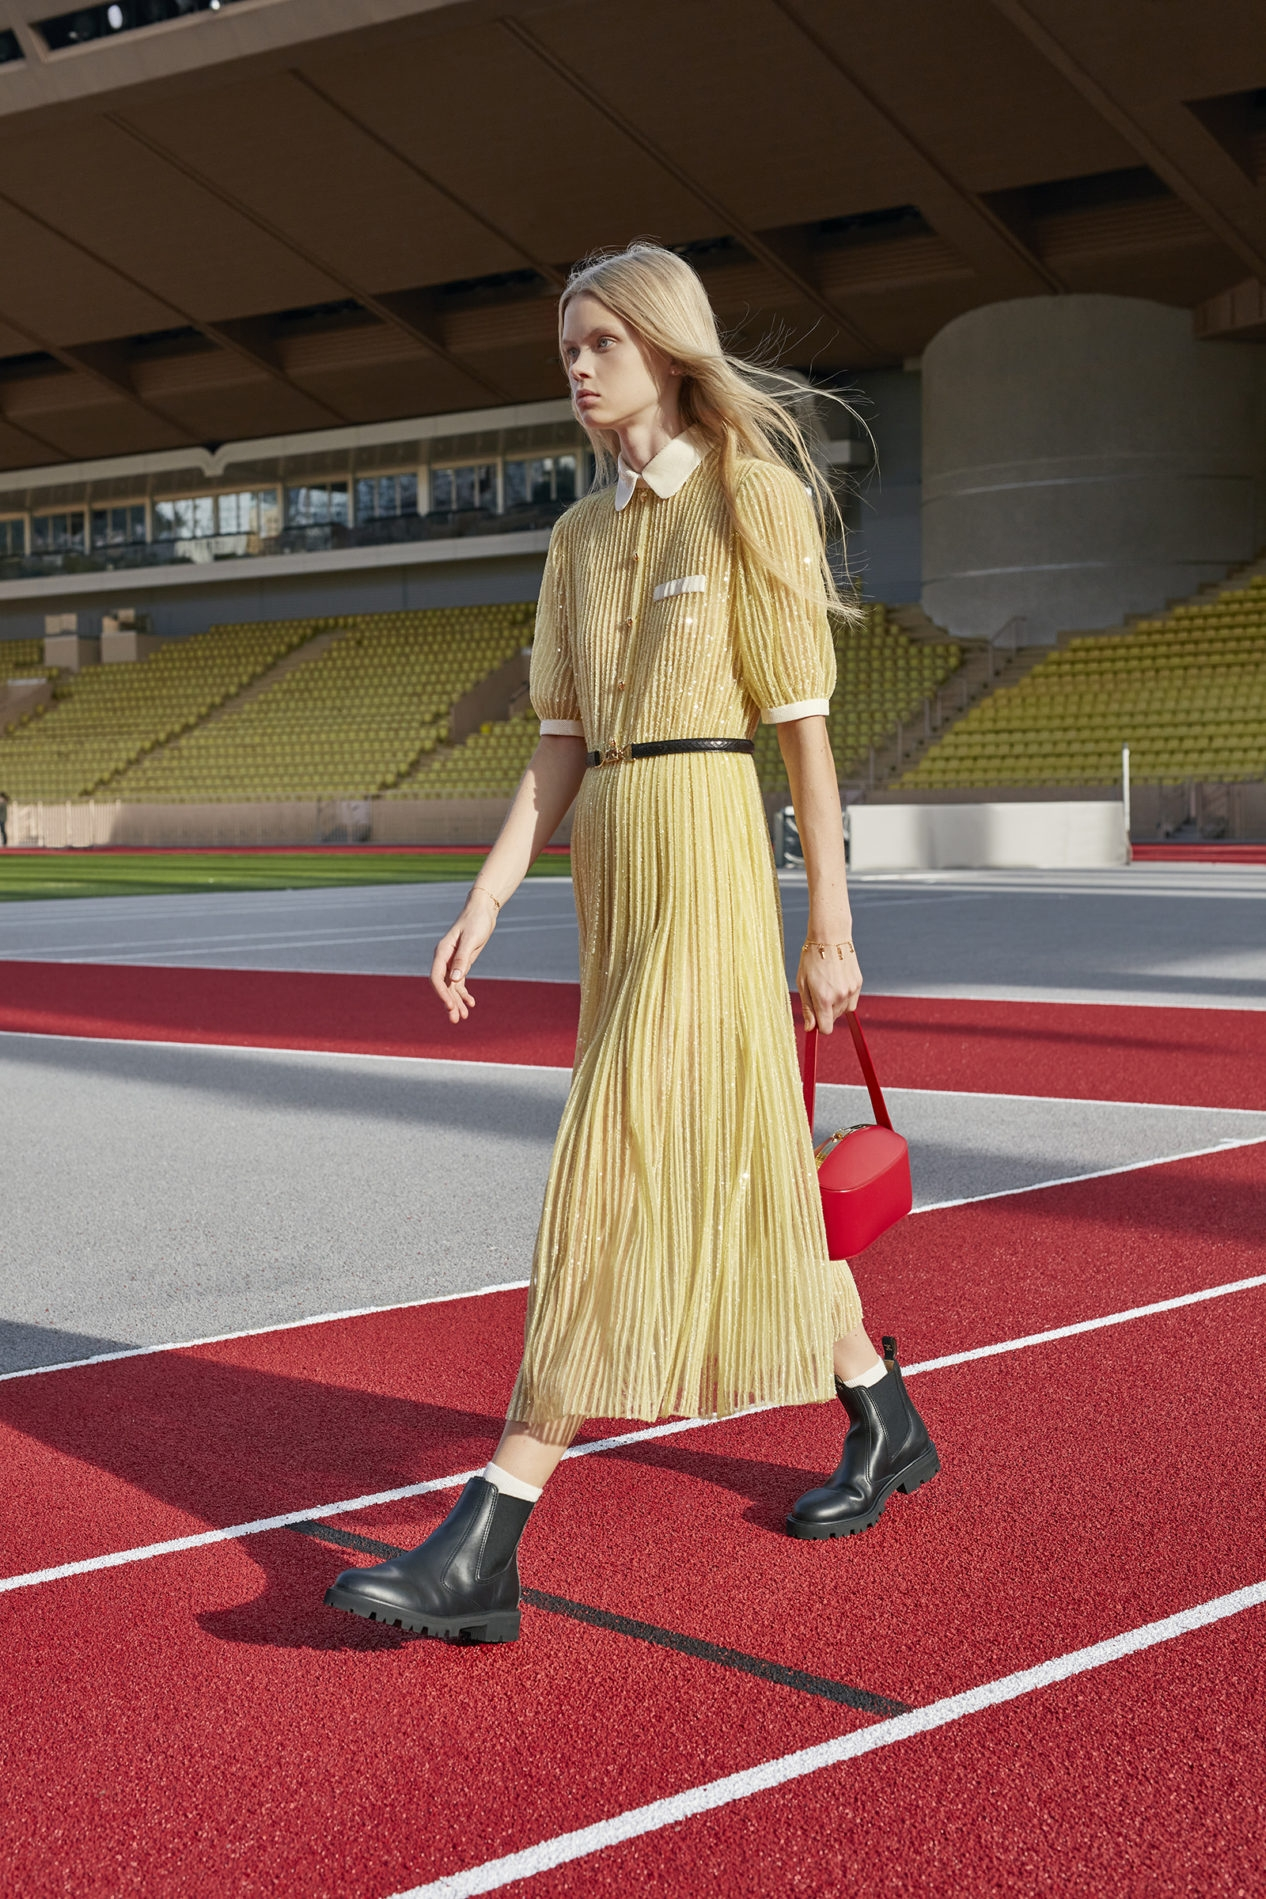 Французская романтика и спорт: Celine показали новую коллекцию весна-лето 2021 (ФОТО) - фото №2